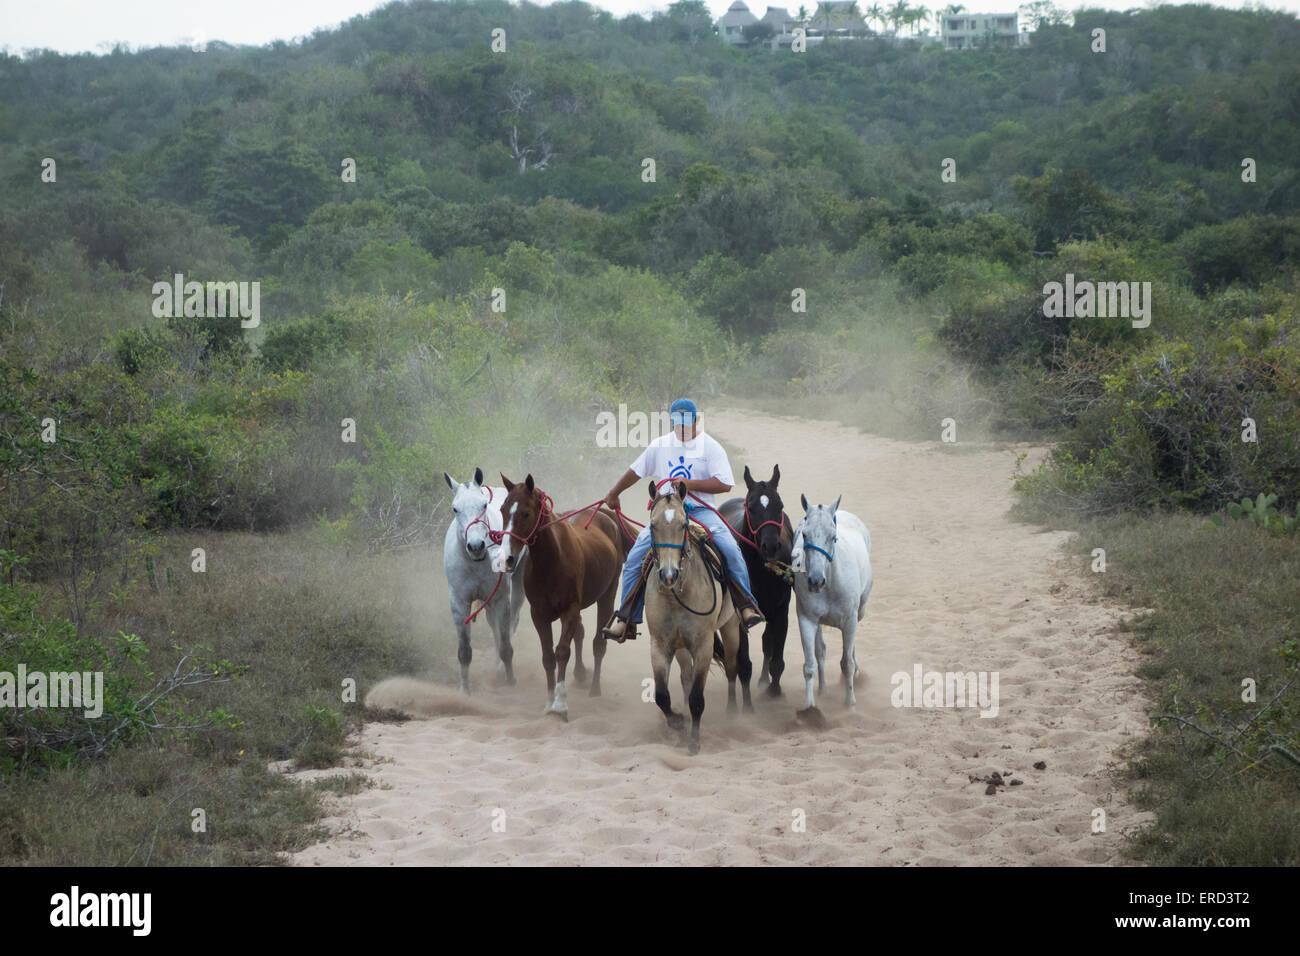 Bräutigam Ausübung Polo-Ponys; Careyes; Costa Careyes, Jalisco, Mexiko Stockbild